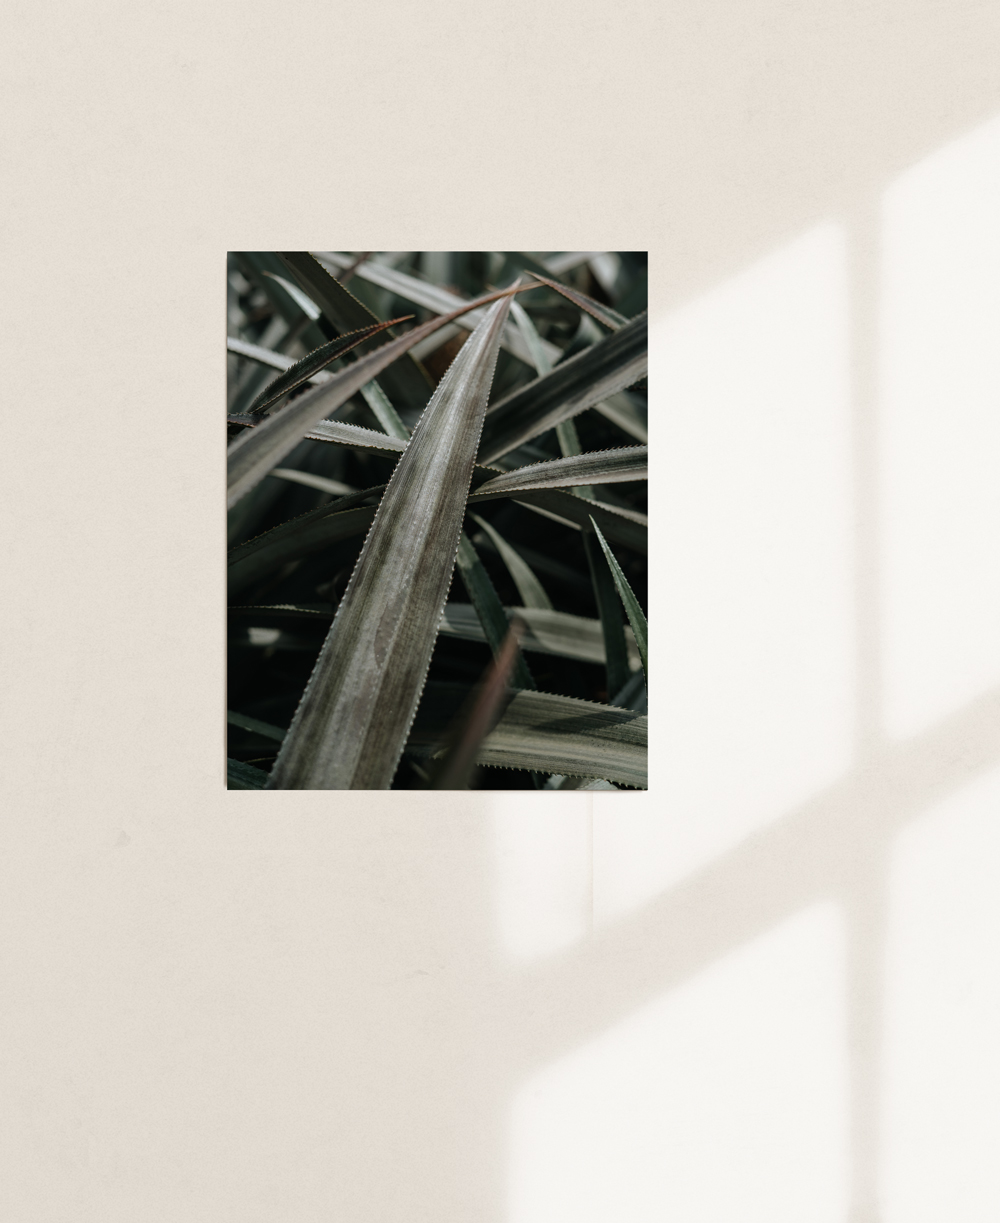 nicischwab-prints-02-003